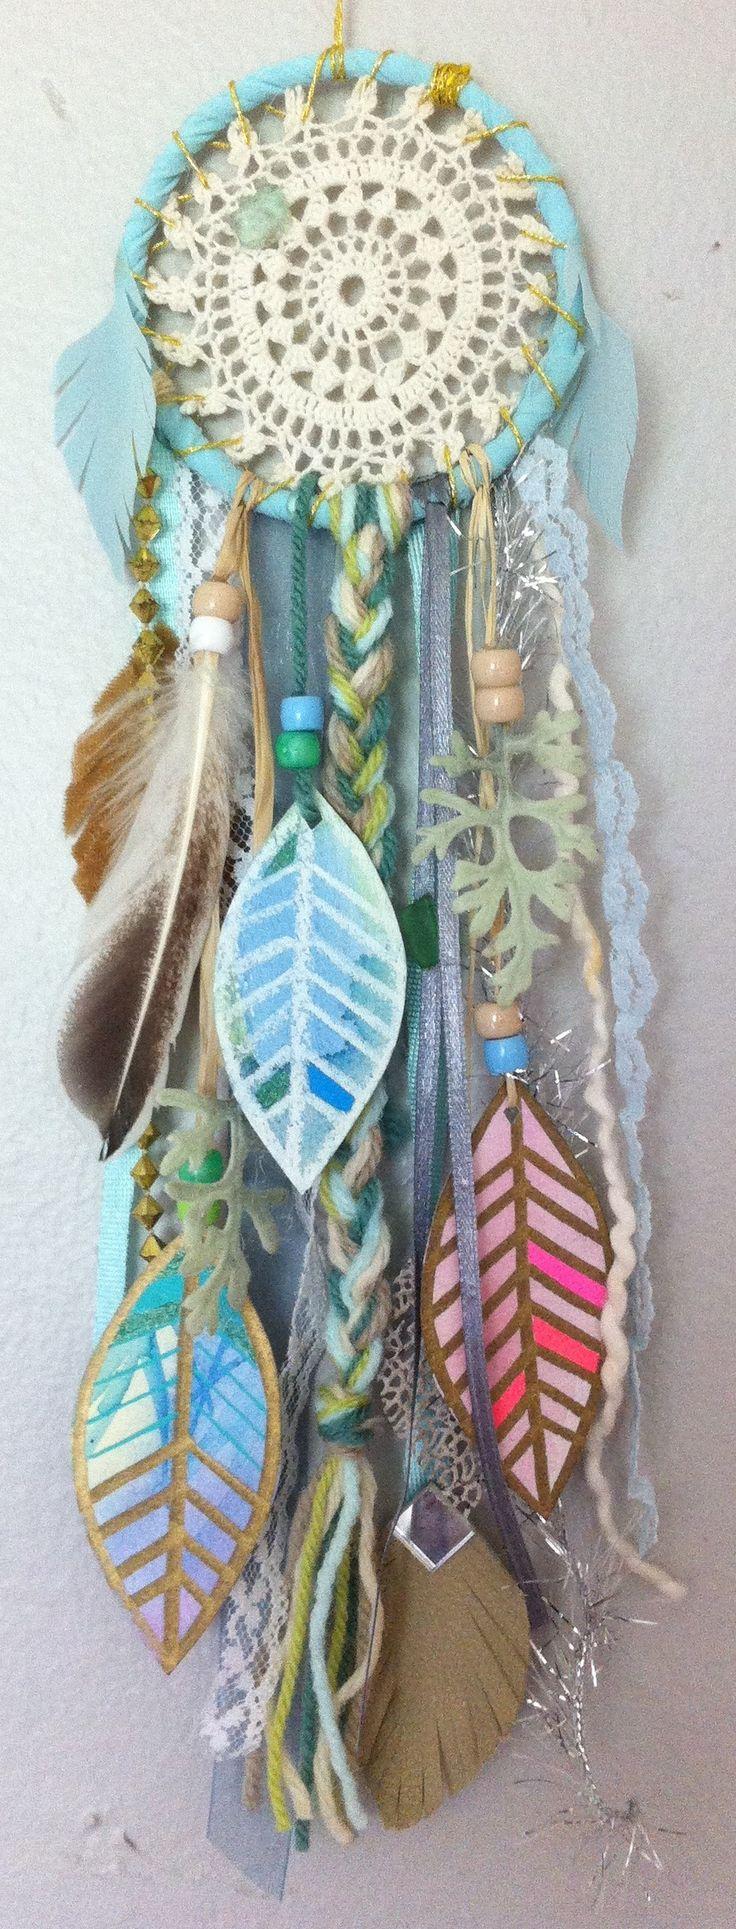 mini dreamcatcher by rachael rice with watercolor feathers https://www.etsy.com/listing/152195304/aqua-dream-little-dreamcatcher-with #aqua #turquoise #vintage